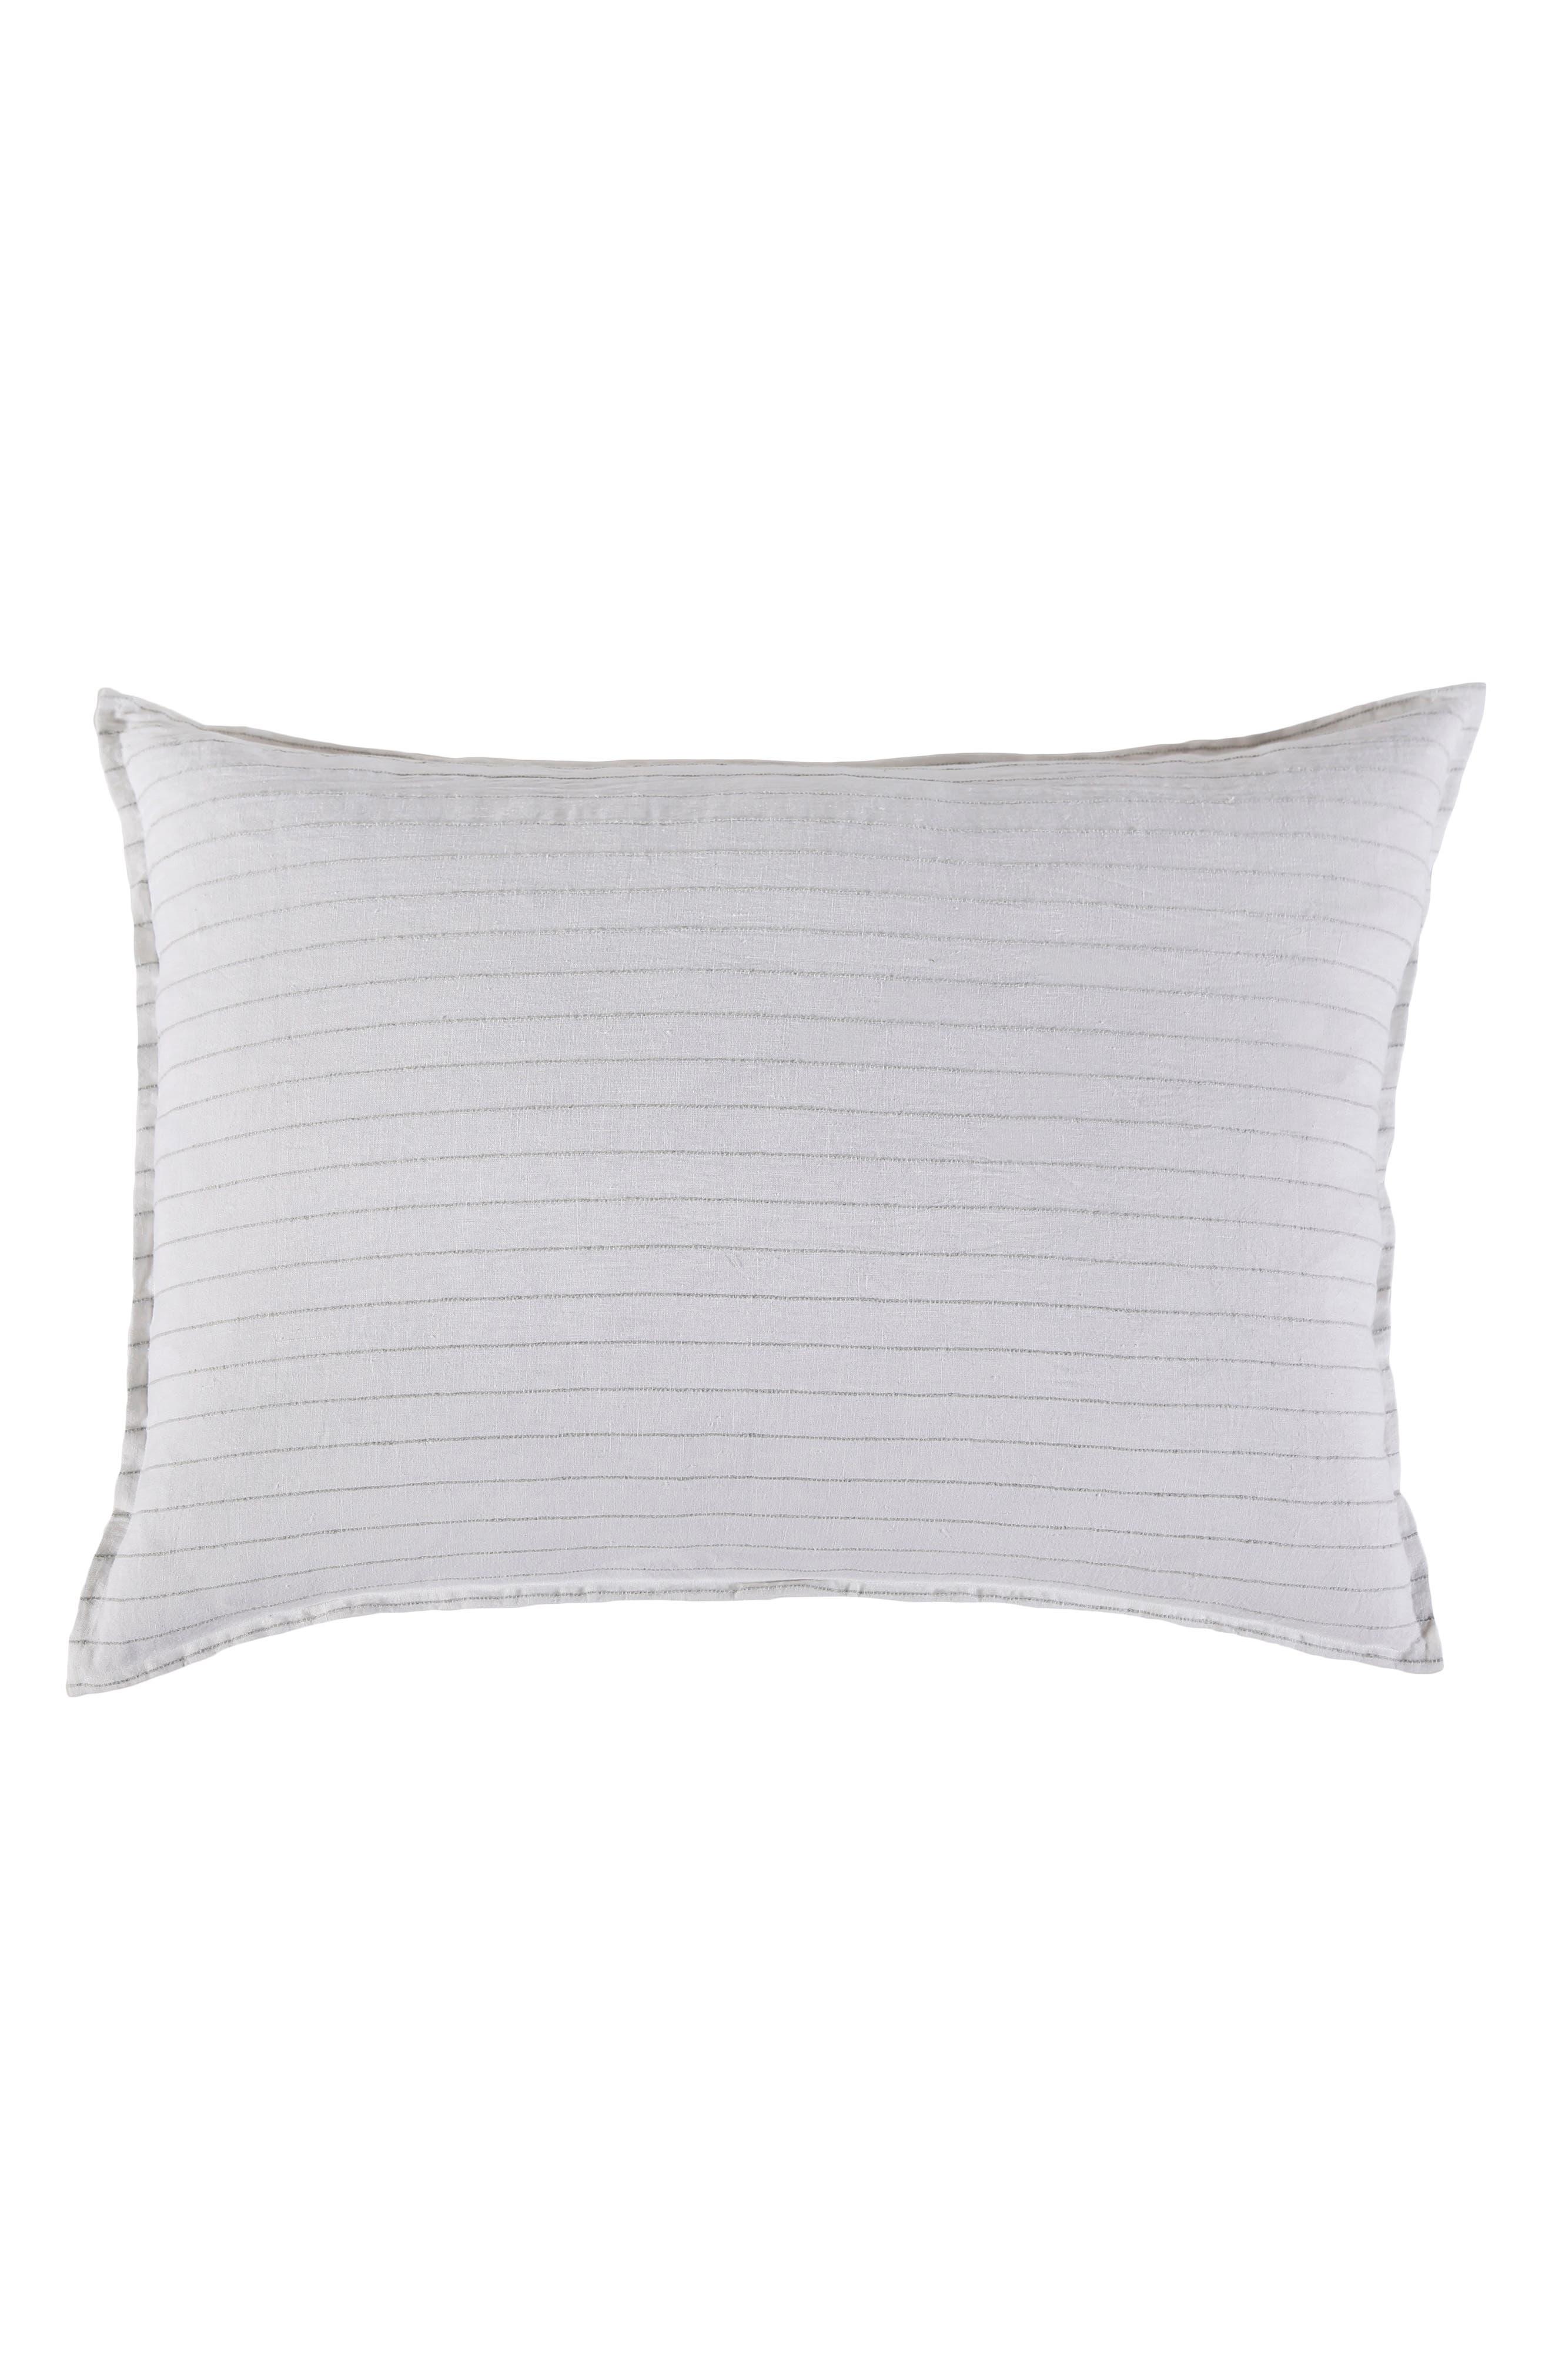 Blake Big Linen Accent Pillow, Main, color, WHITE/ OCEAN